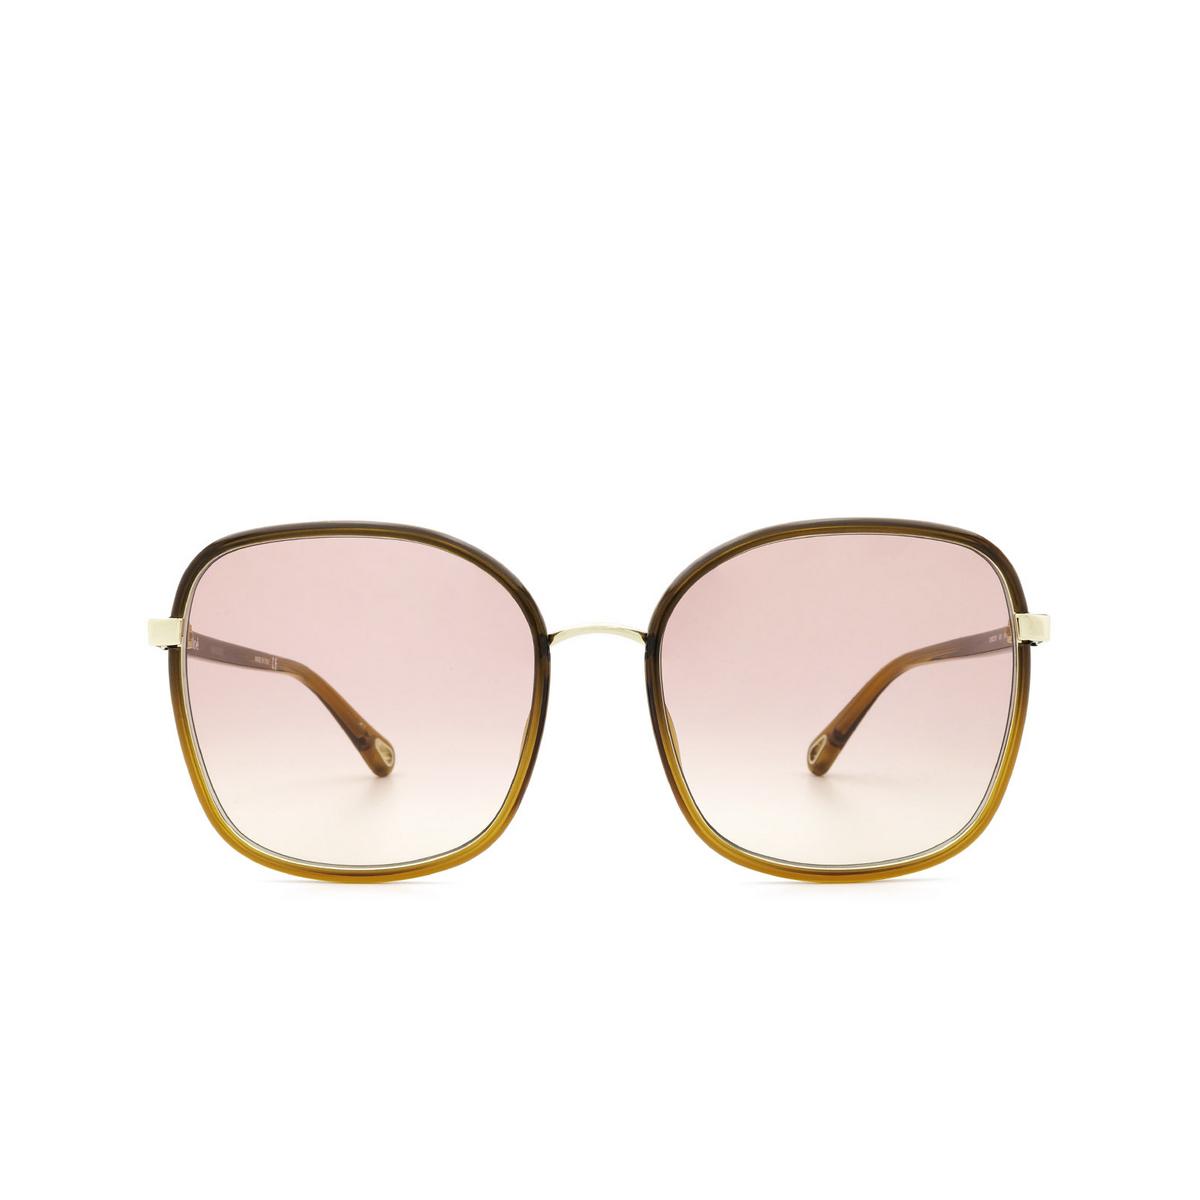 Chloé® Square Sunglasses: CH0031S color Brown 006 - front view.